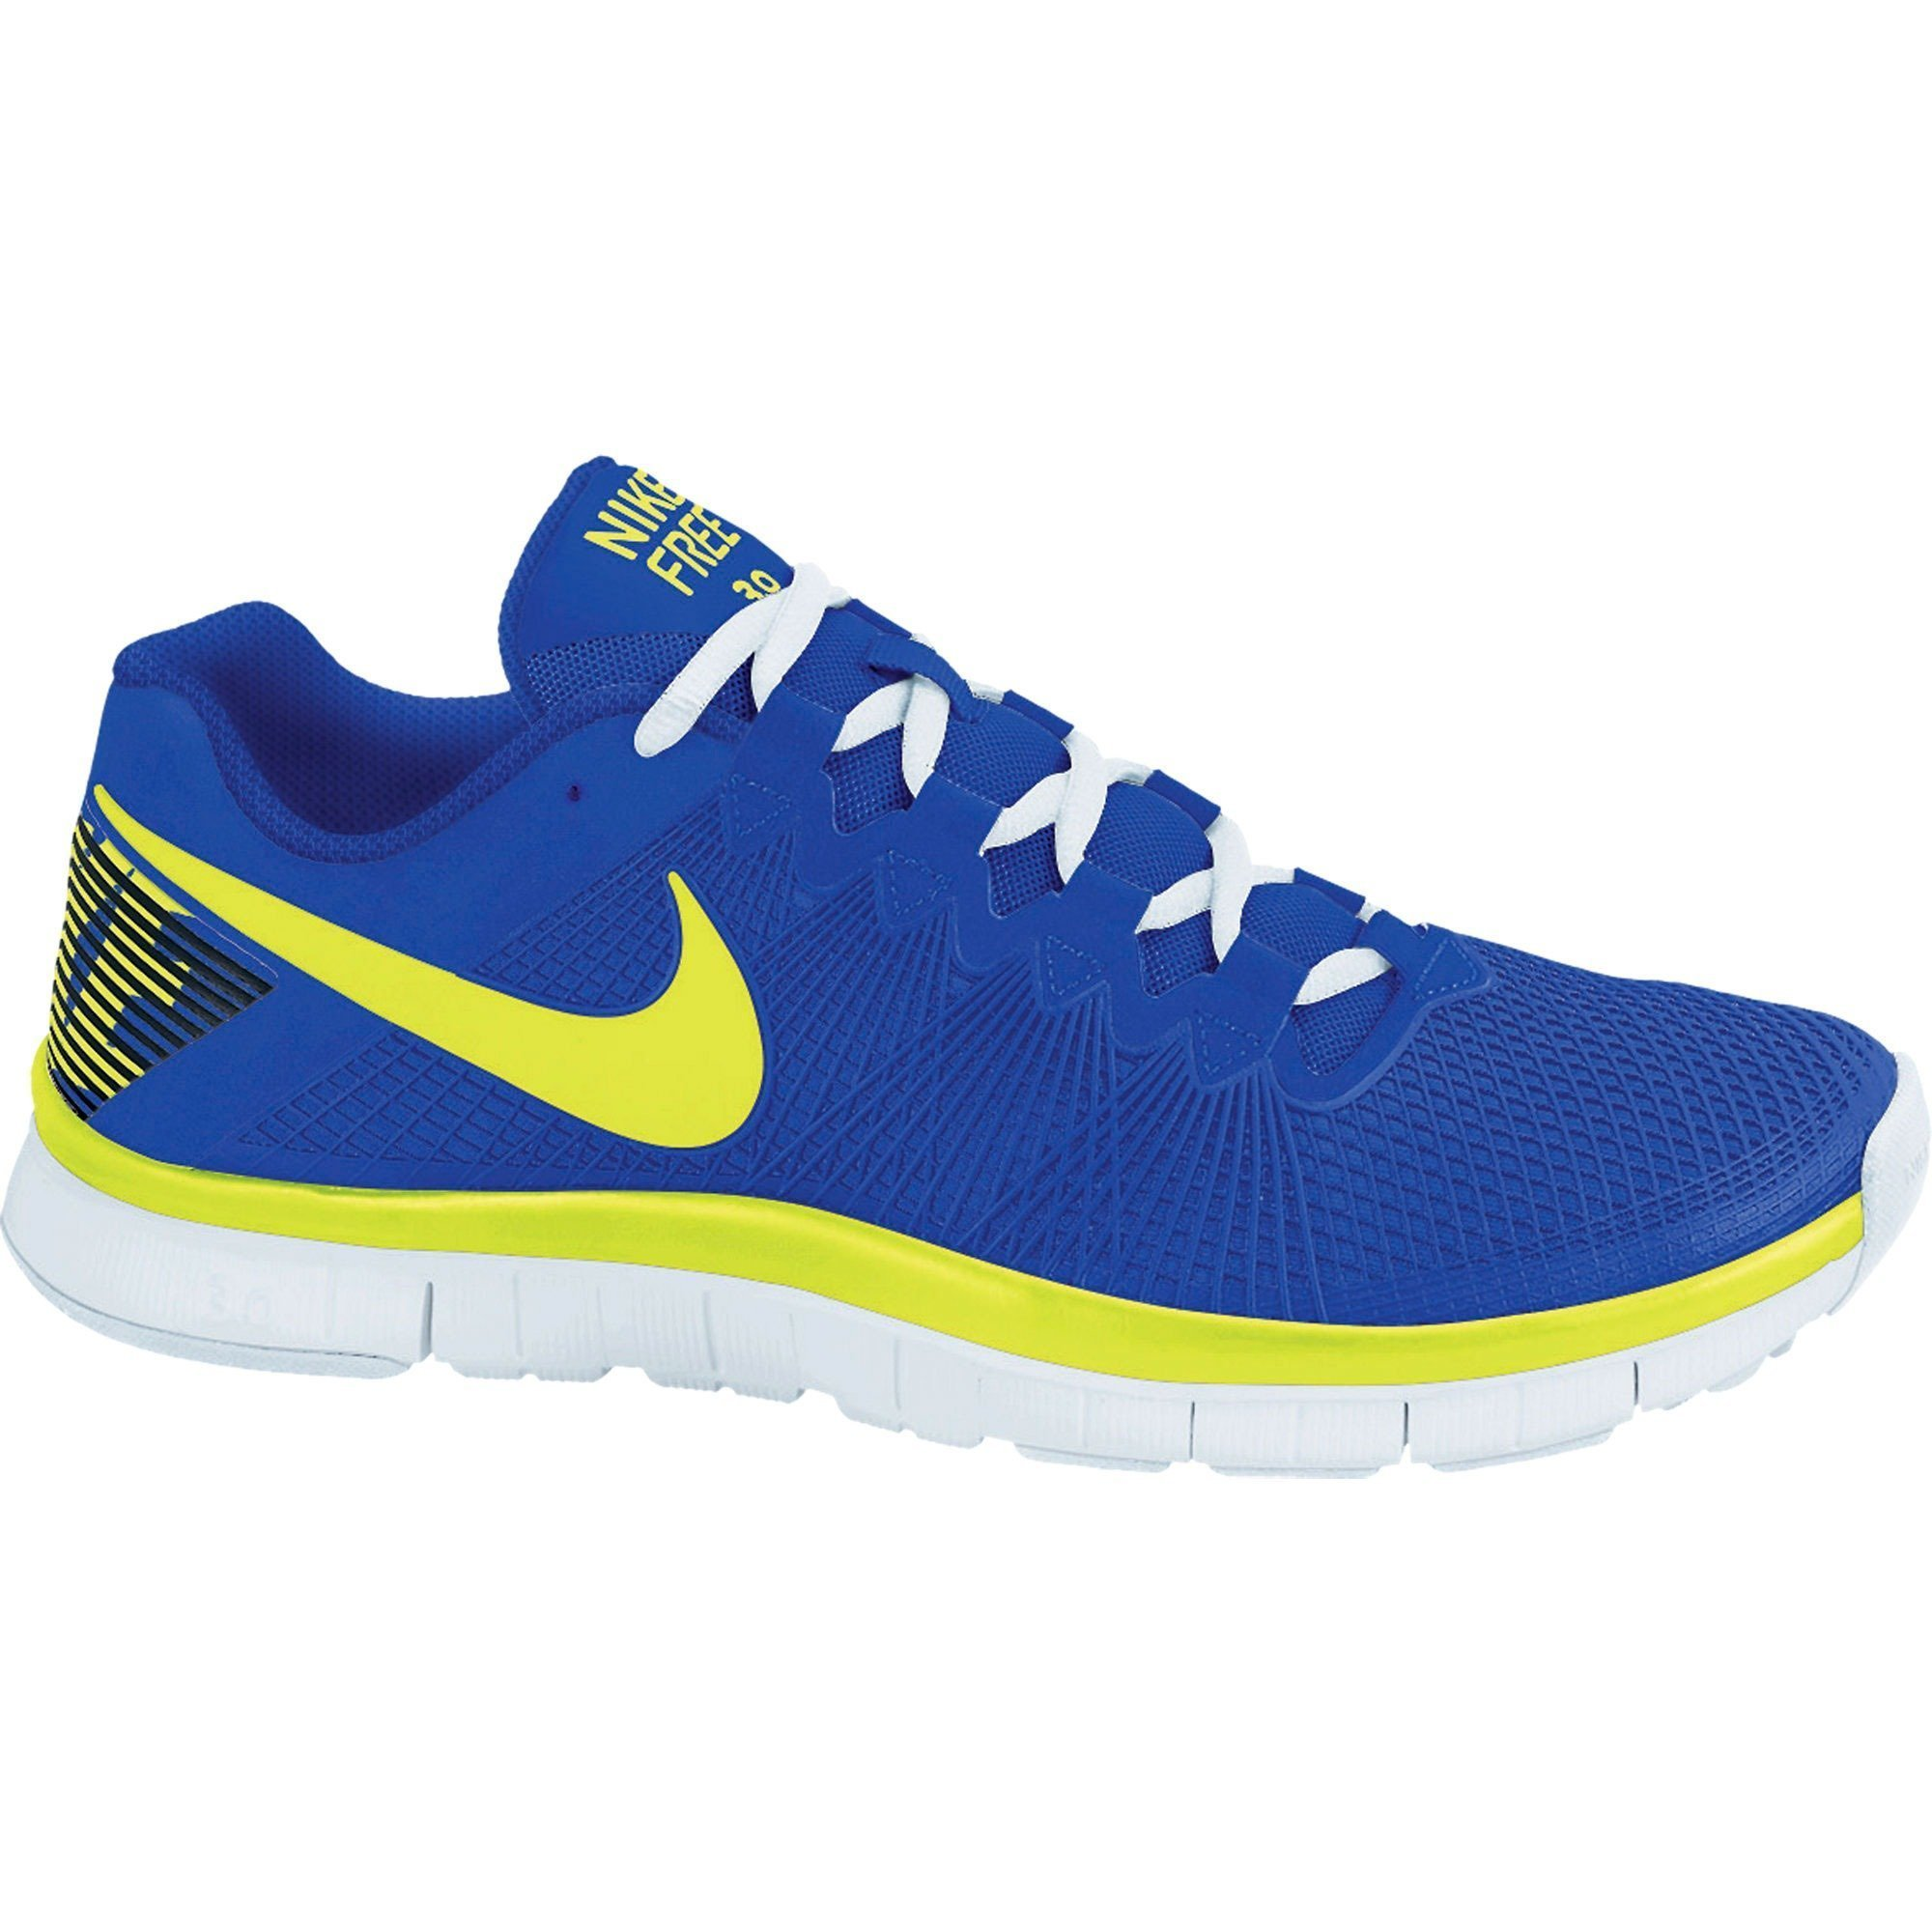 Nike Free 3.0 Training